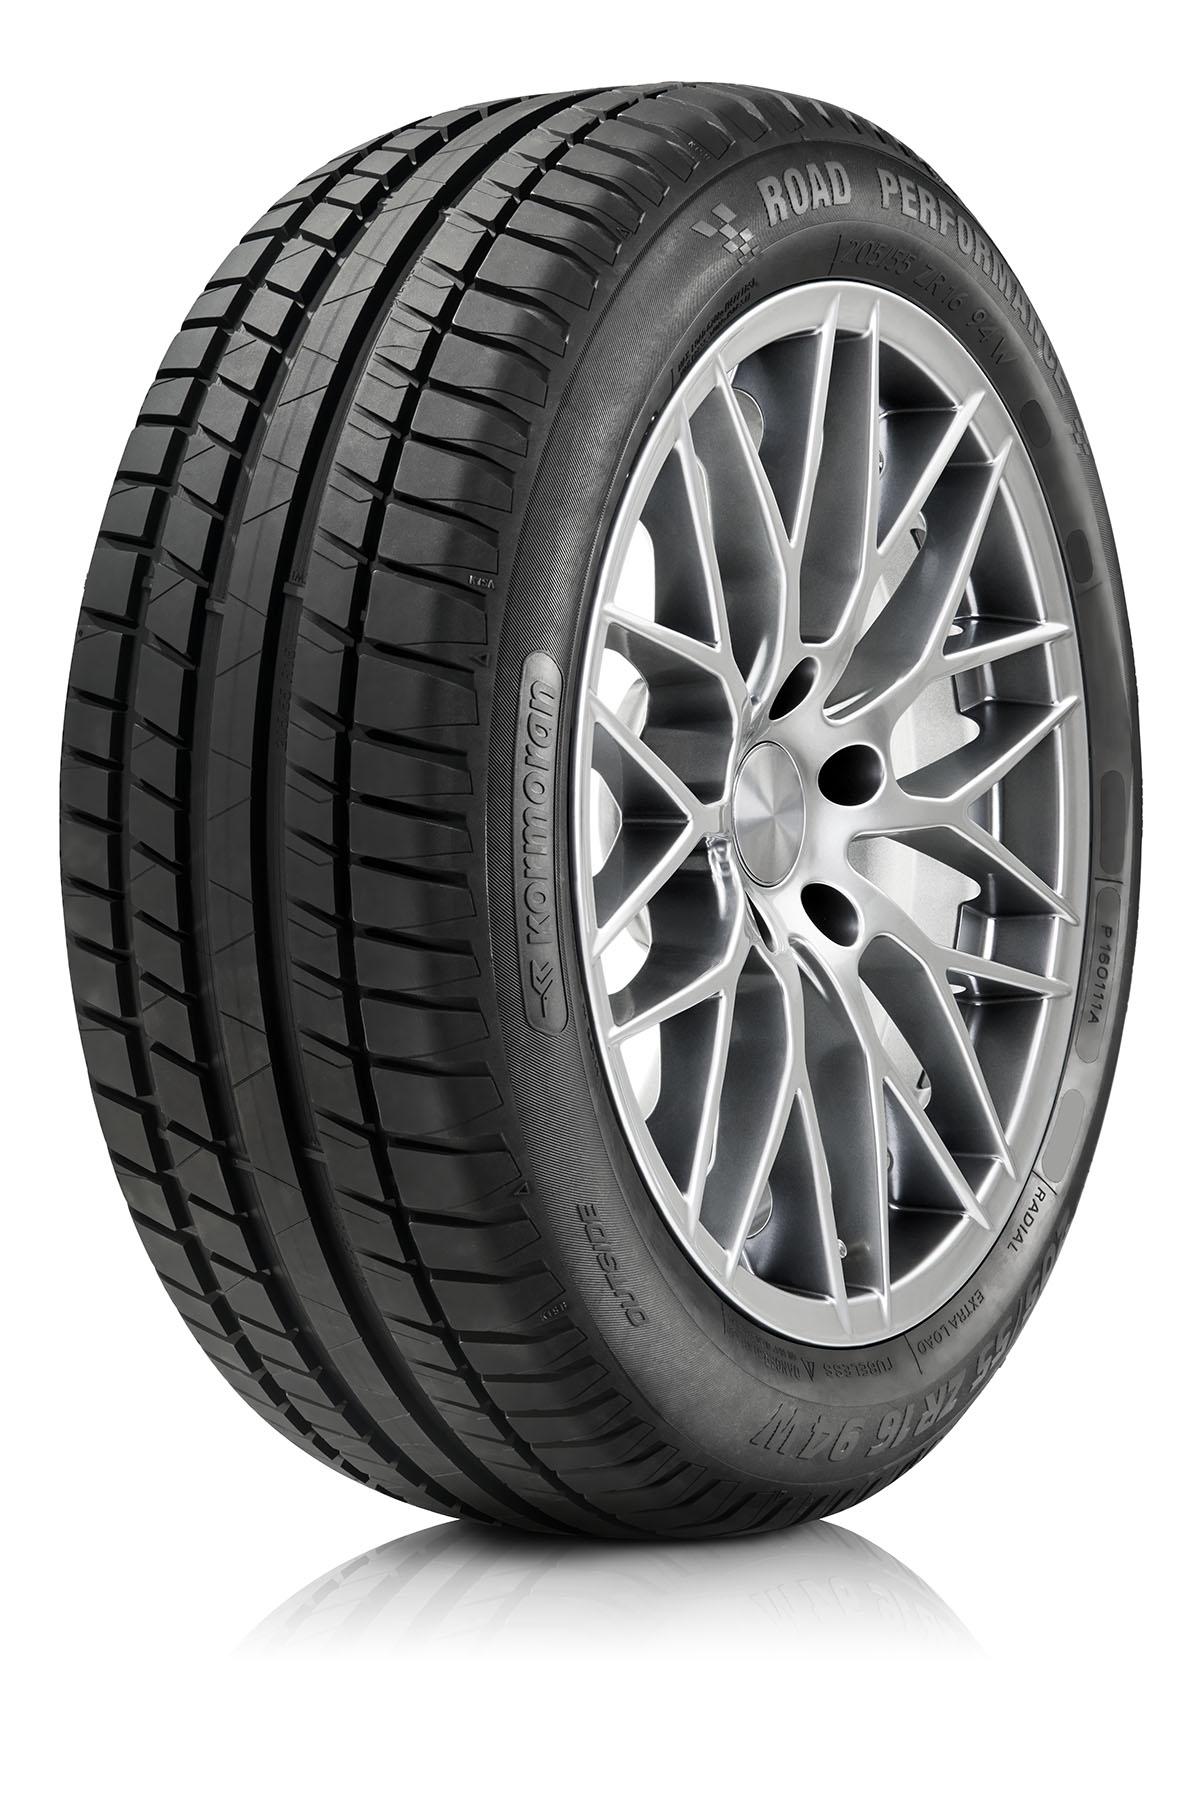 kormoran road performance 205 55 r16 94w pneu ds. Black Bedroom Furniture Sets. Home Design Ideas